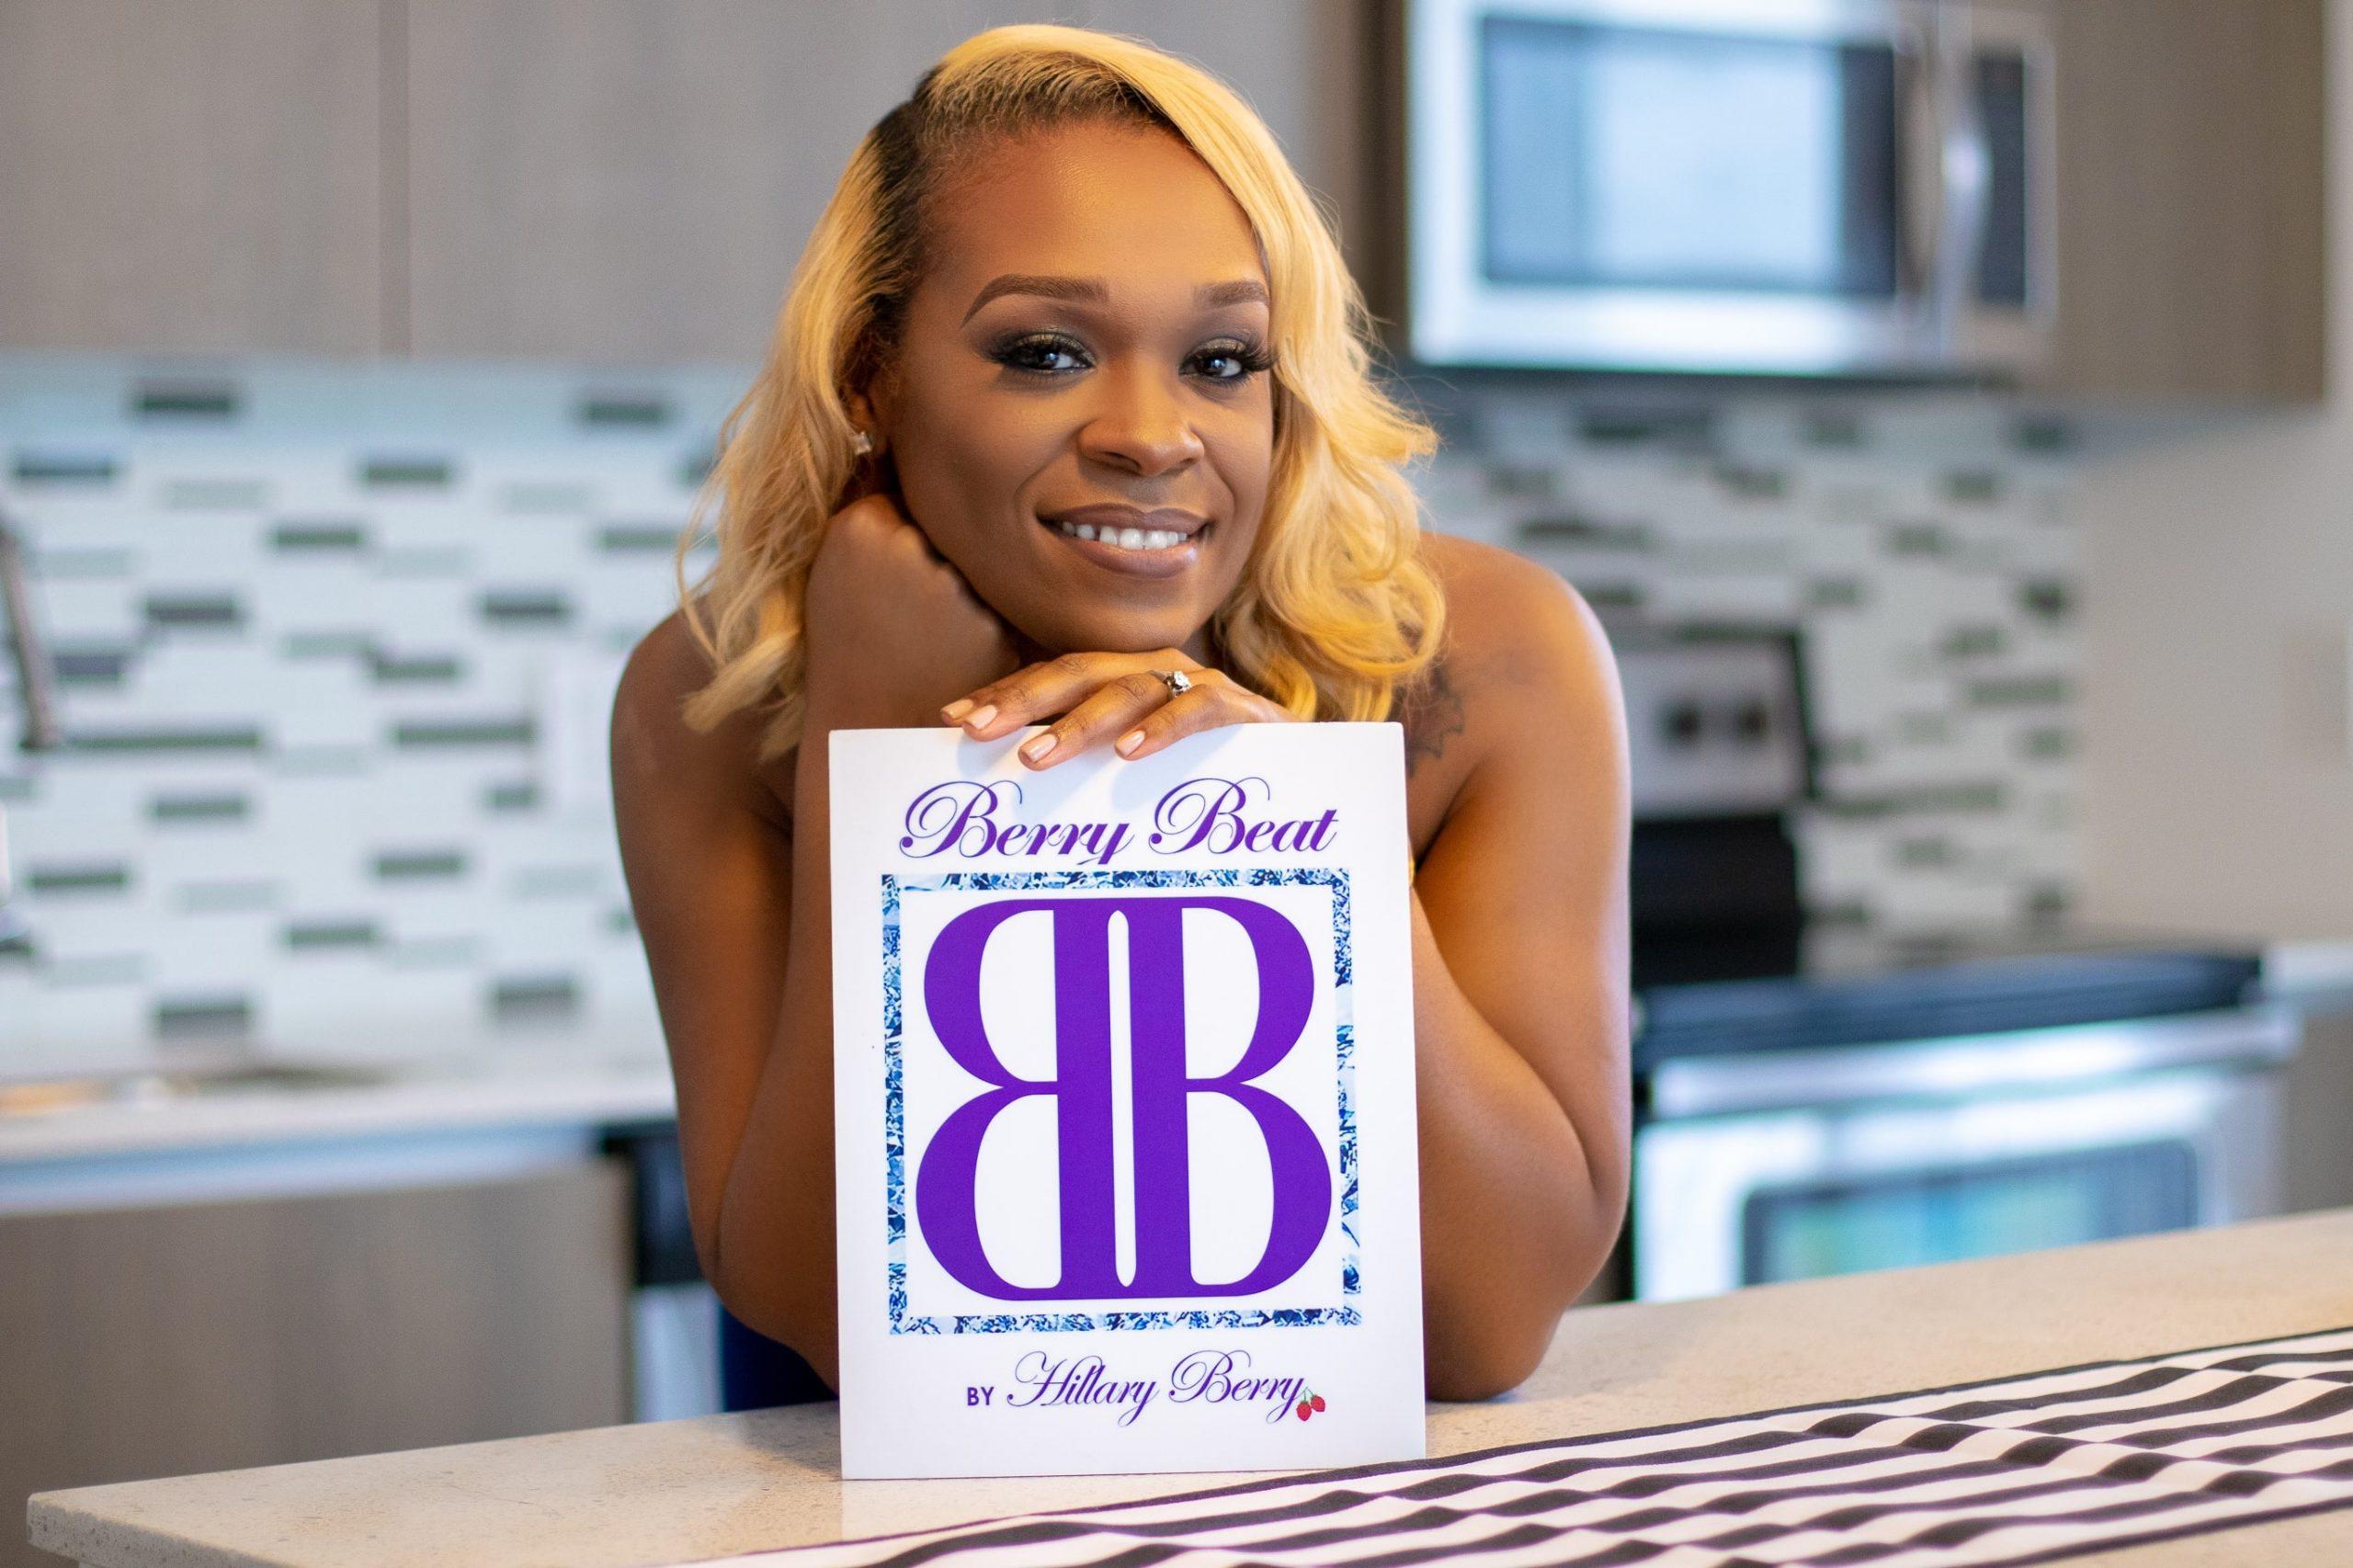 Berry Beat Beauty by Hillary Berry, South FL Makeup Artist